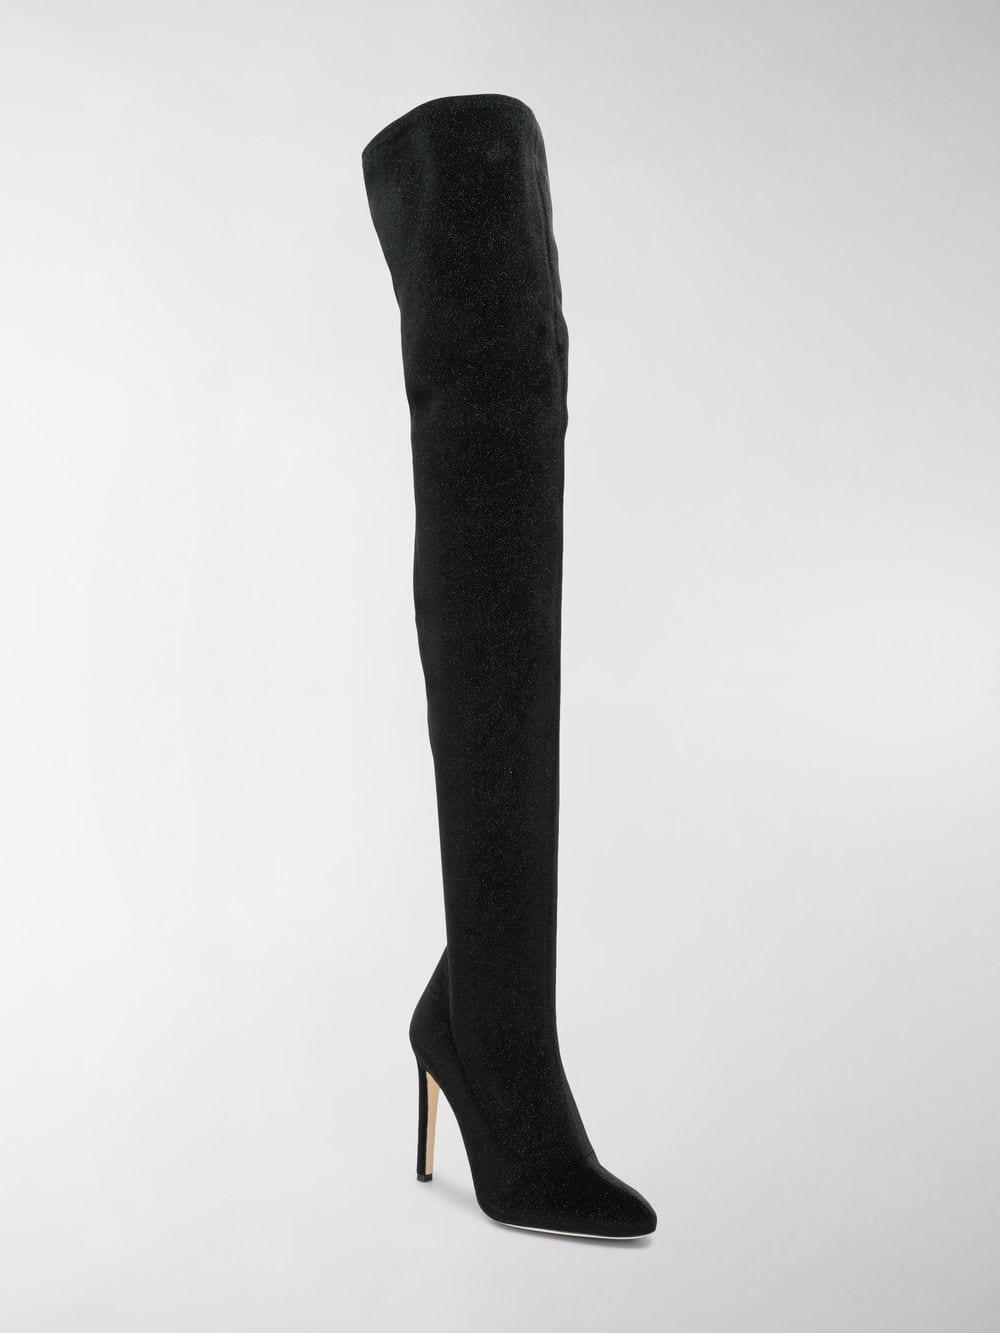 e3a2dcc33351 Giuseppe Zanotti Dena Thigh-high Boots in Black - Lyst